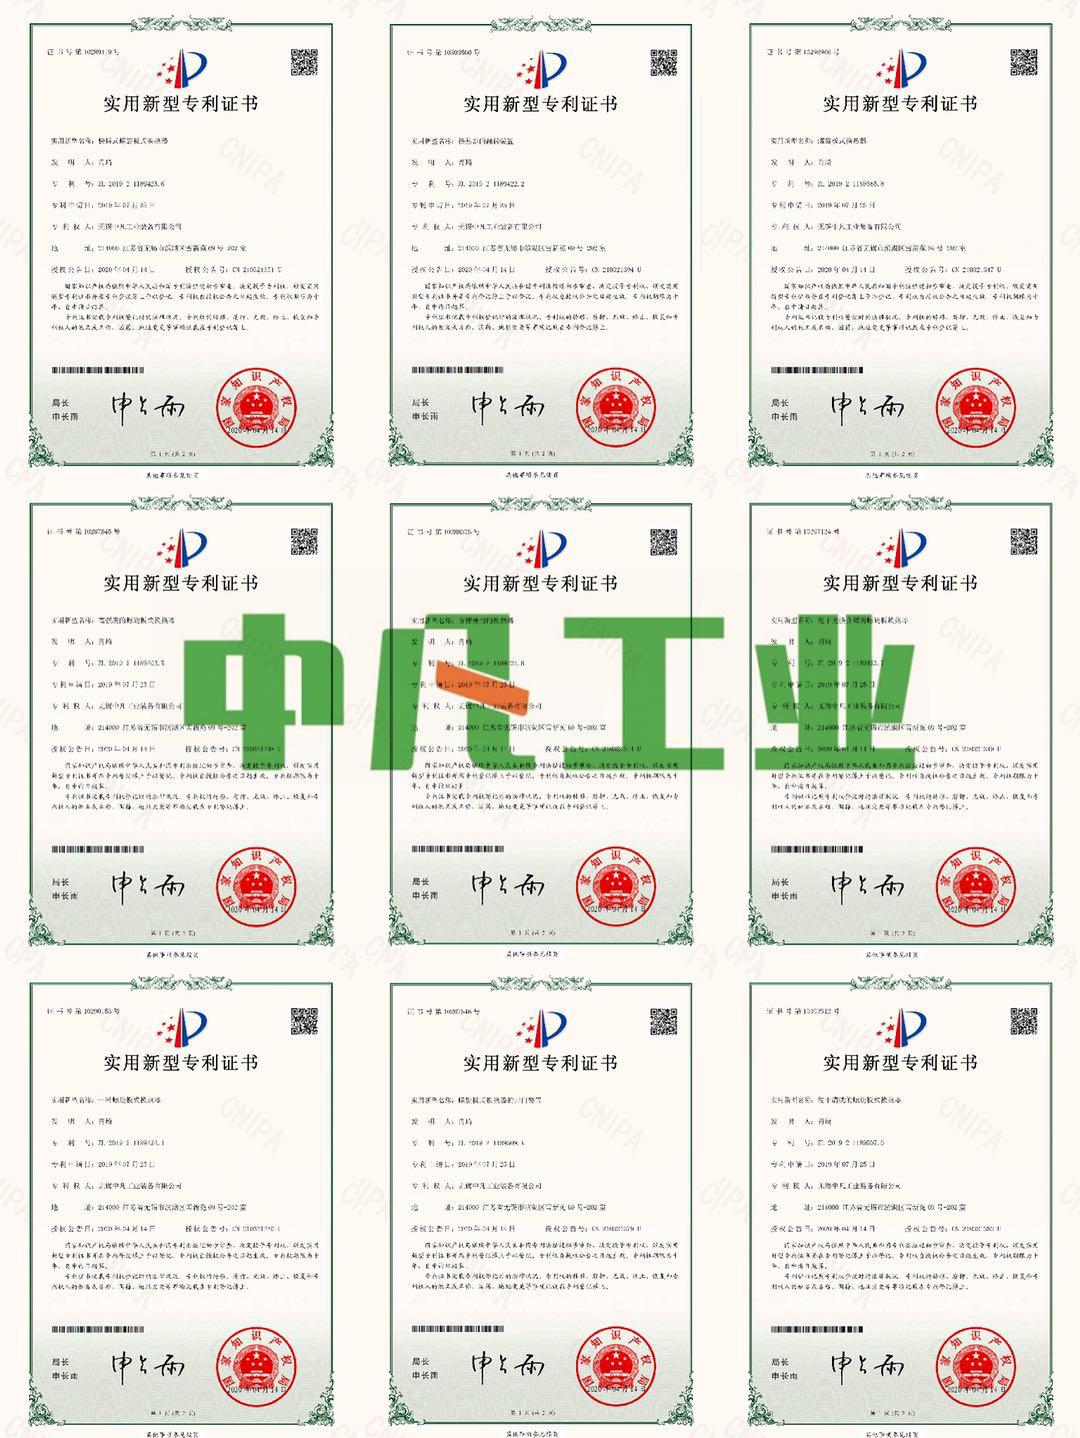 AG9工業:螺旋板式換熱器專利證書獲得授權